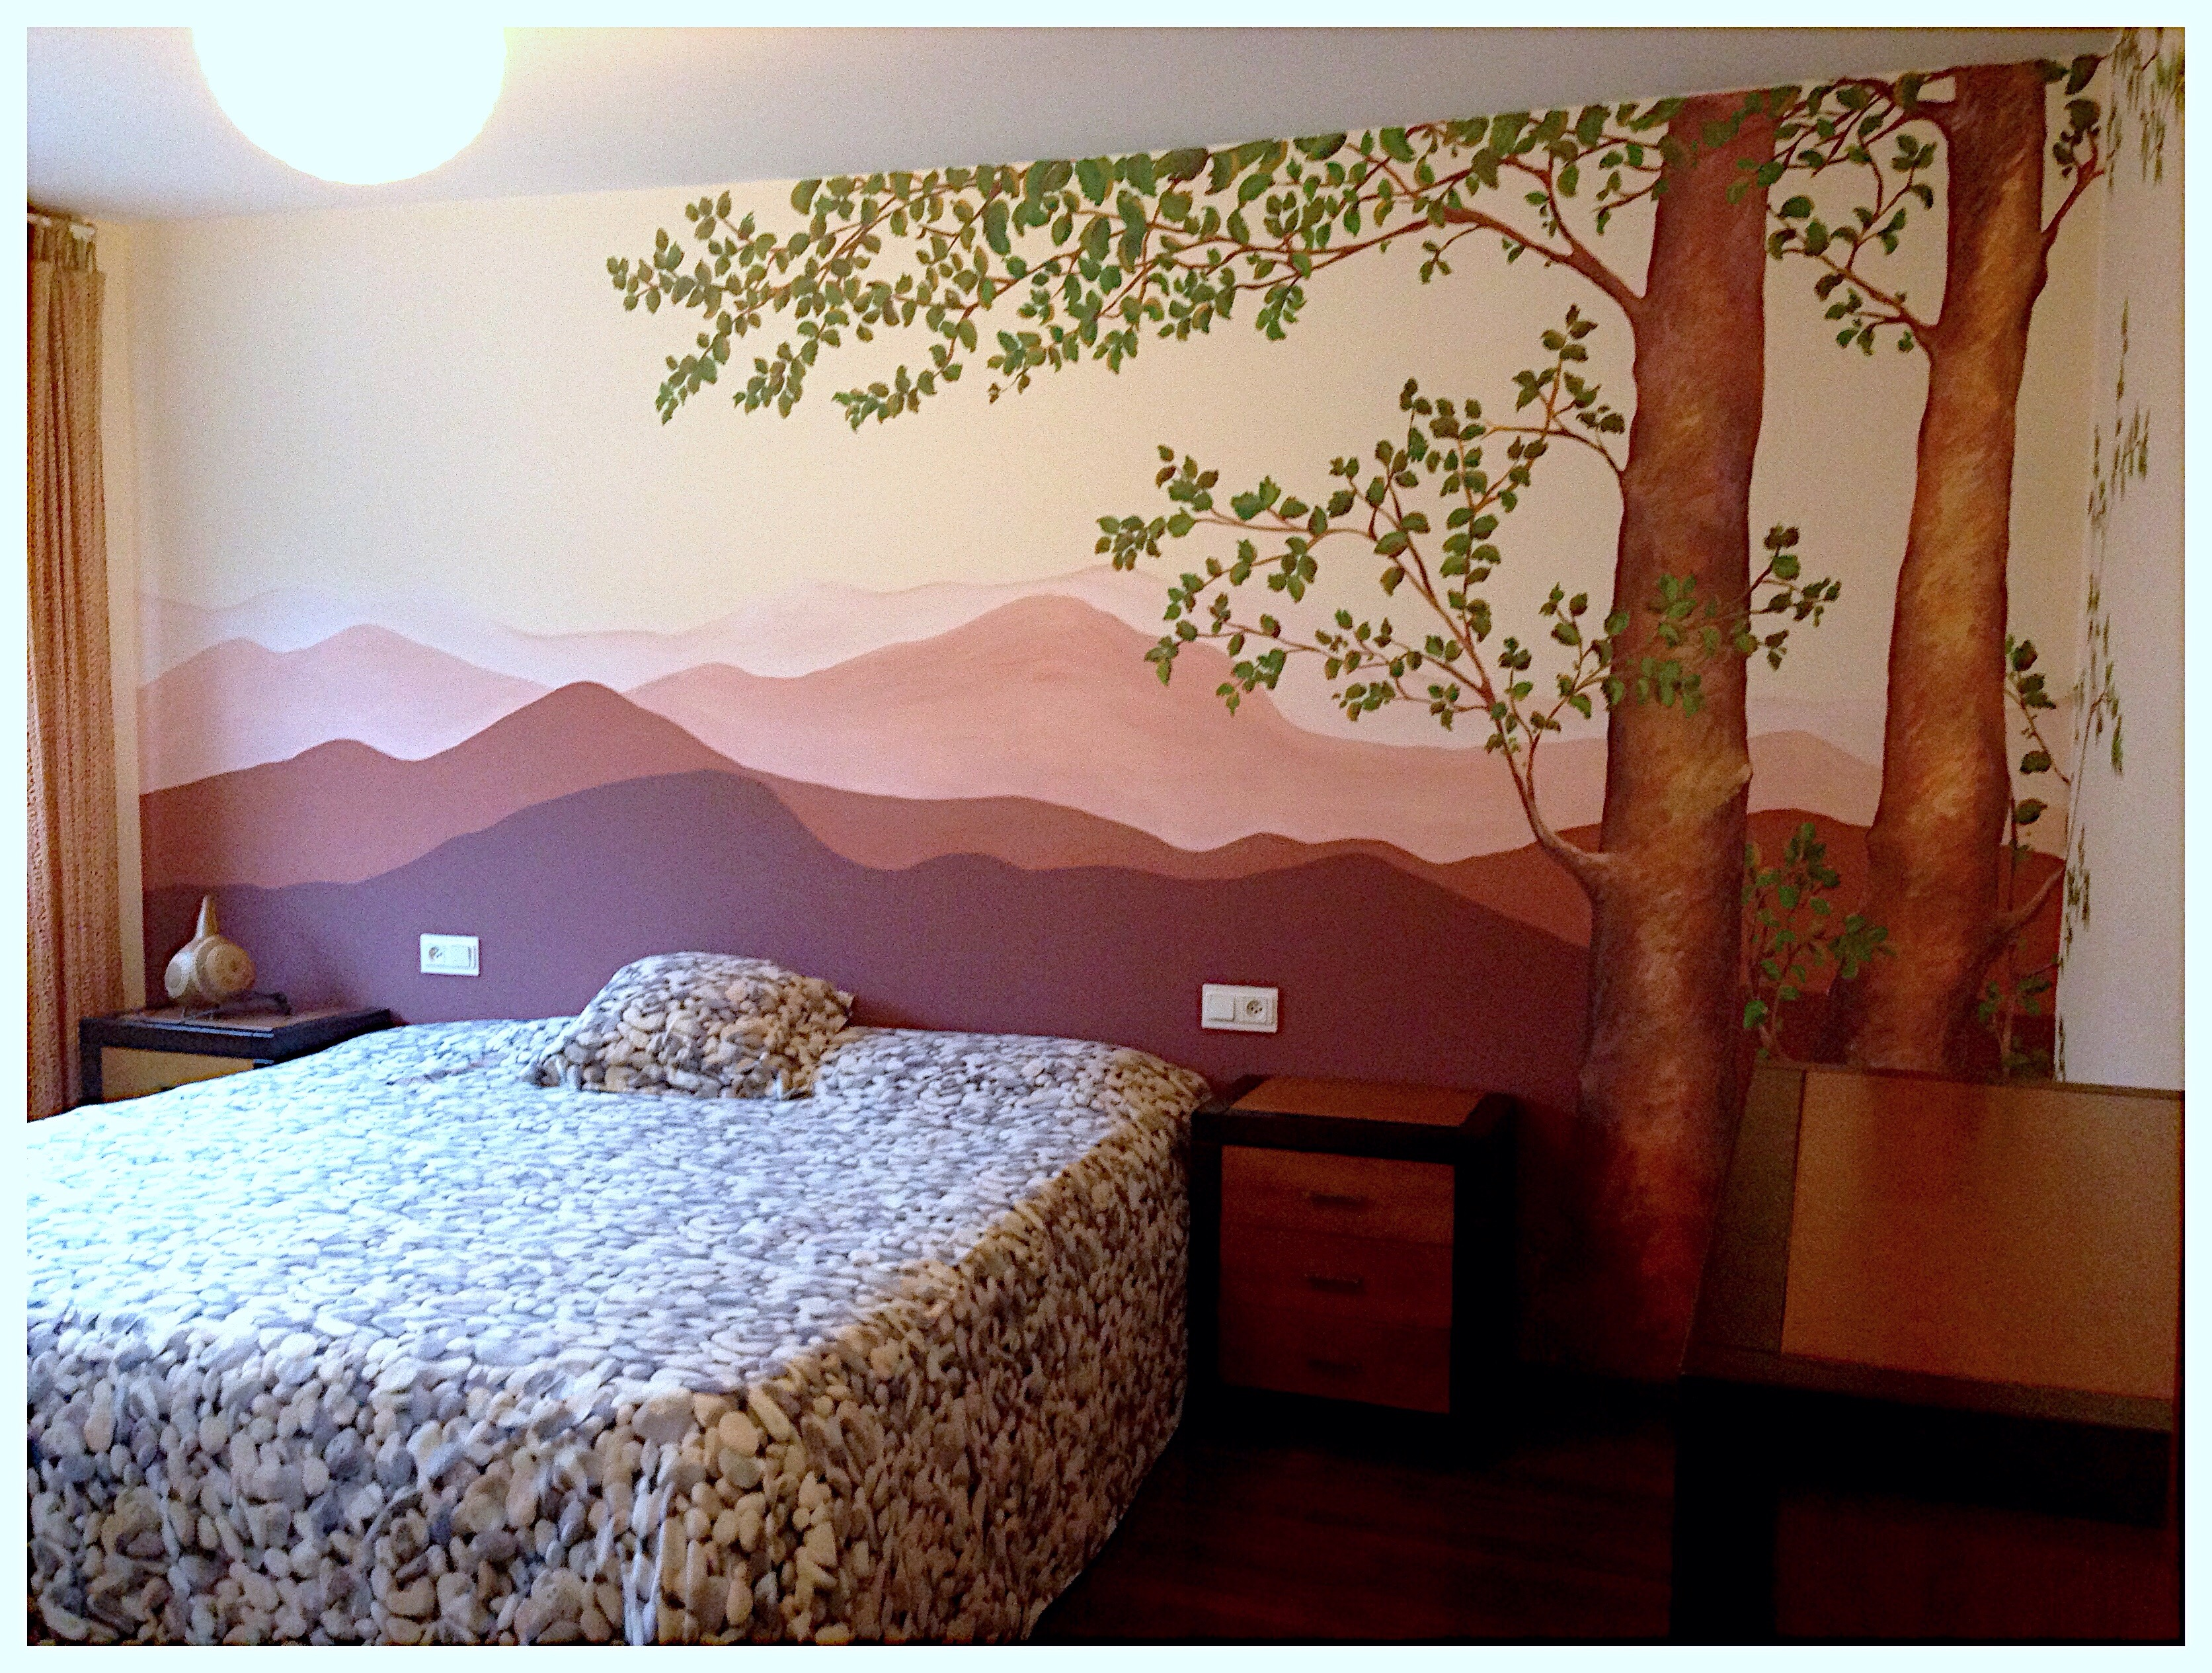 Mural dormitorio. www.begoperezherrera.com